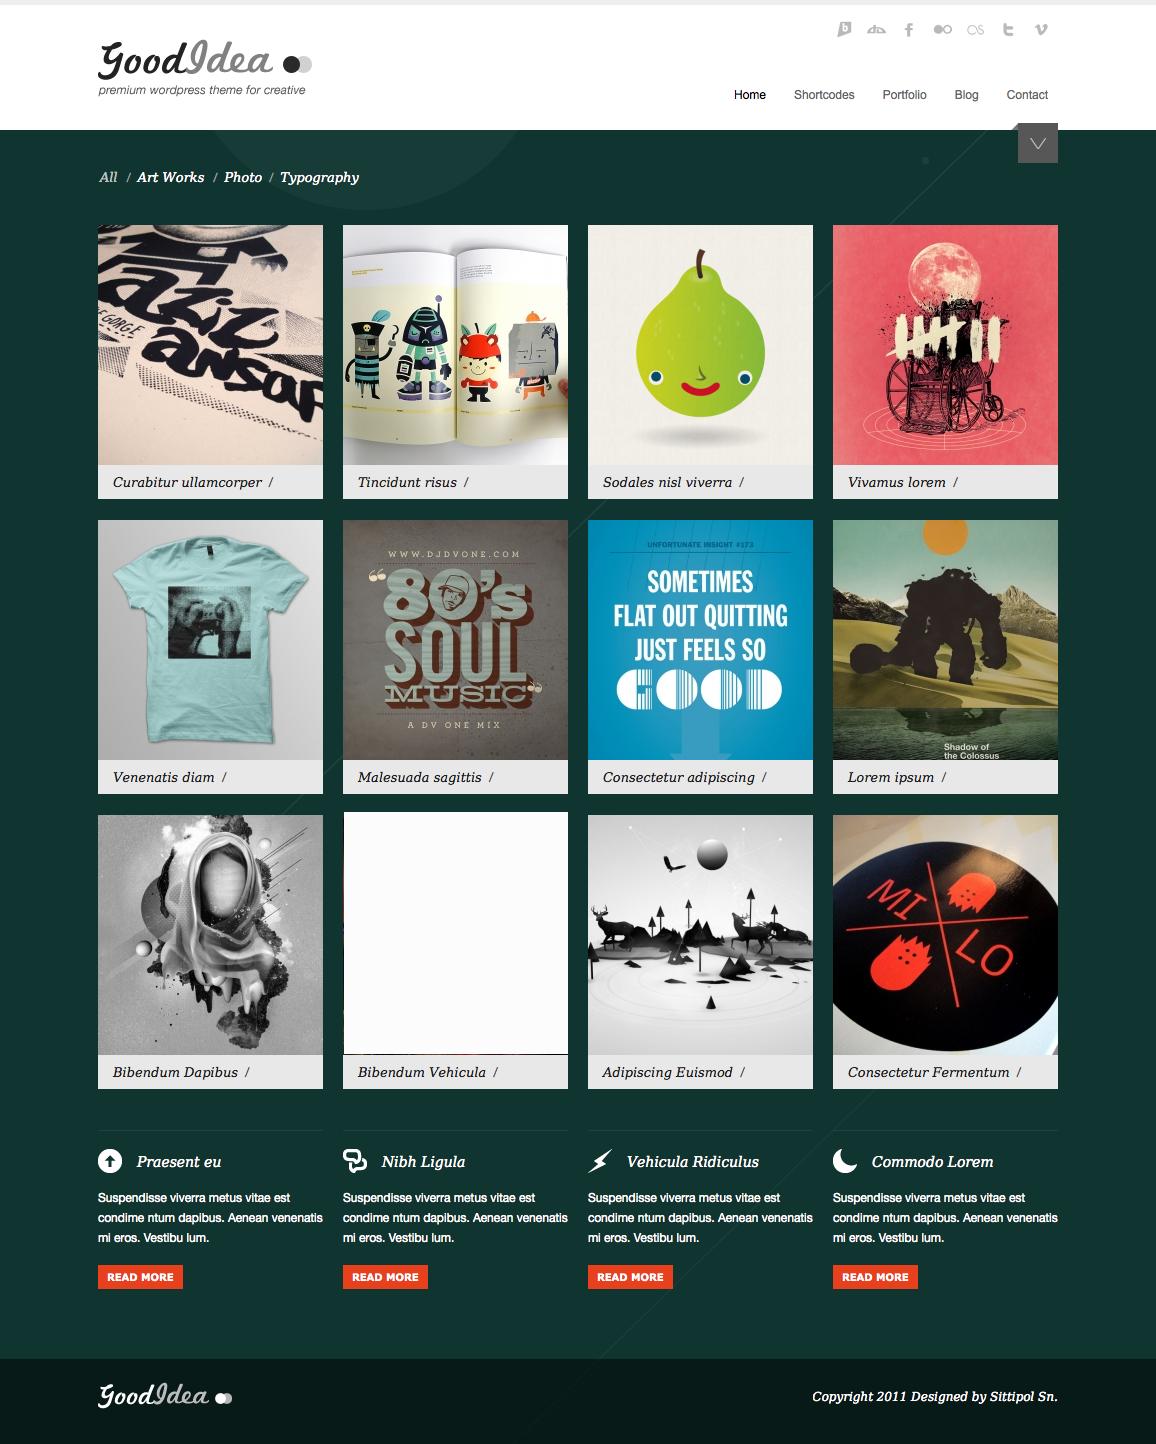 Goodidea - creative wordpress theme - homepage with green dark